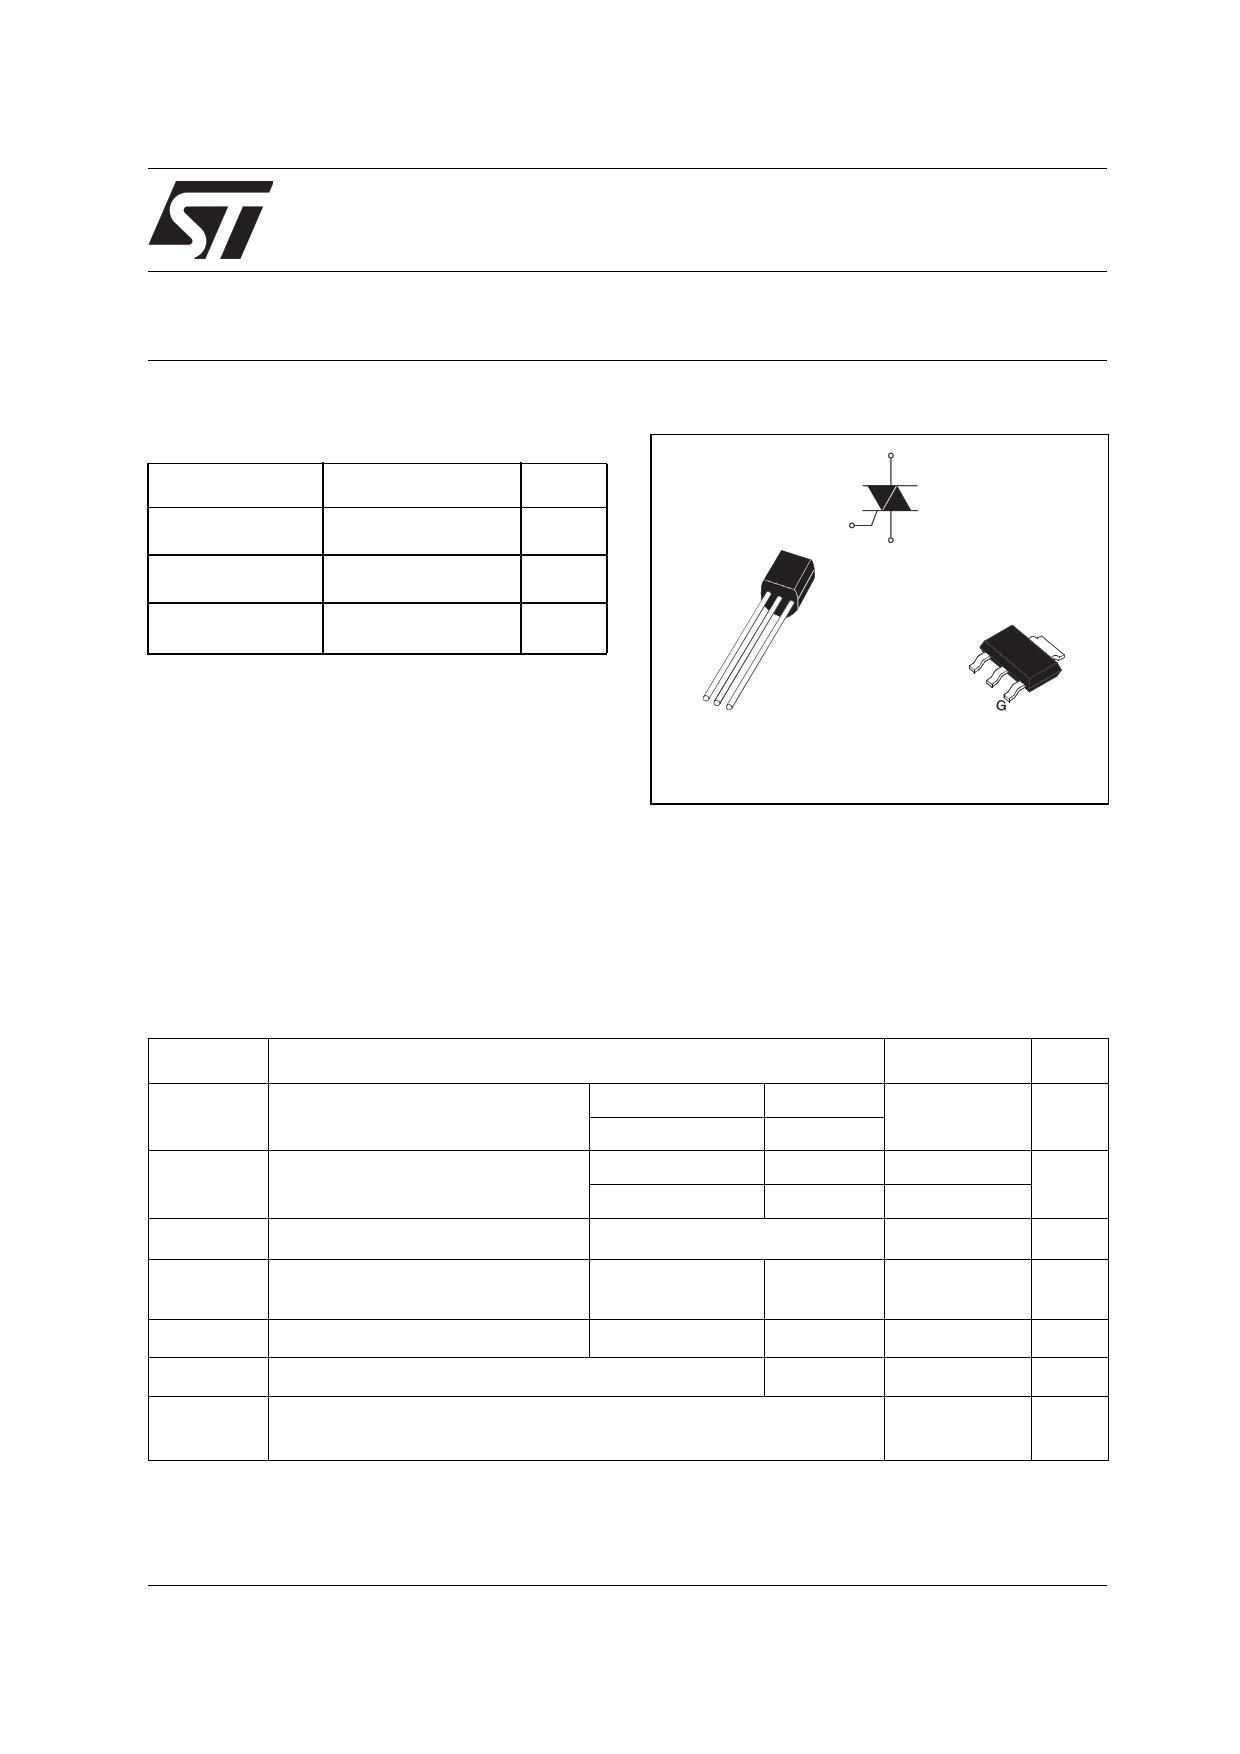 Z0110MN datasheet